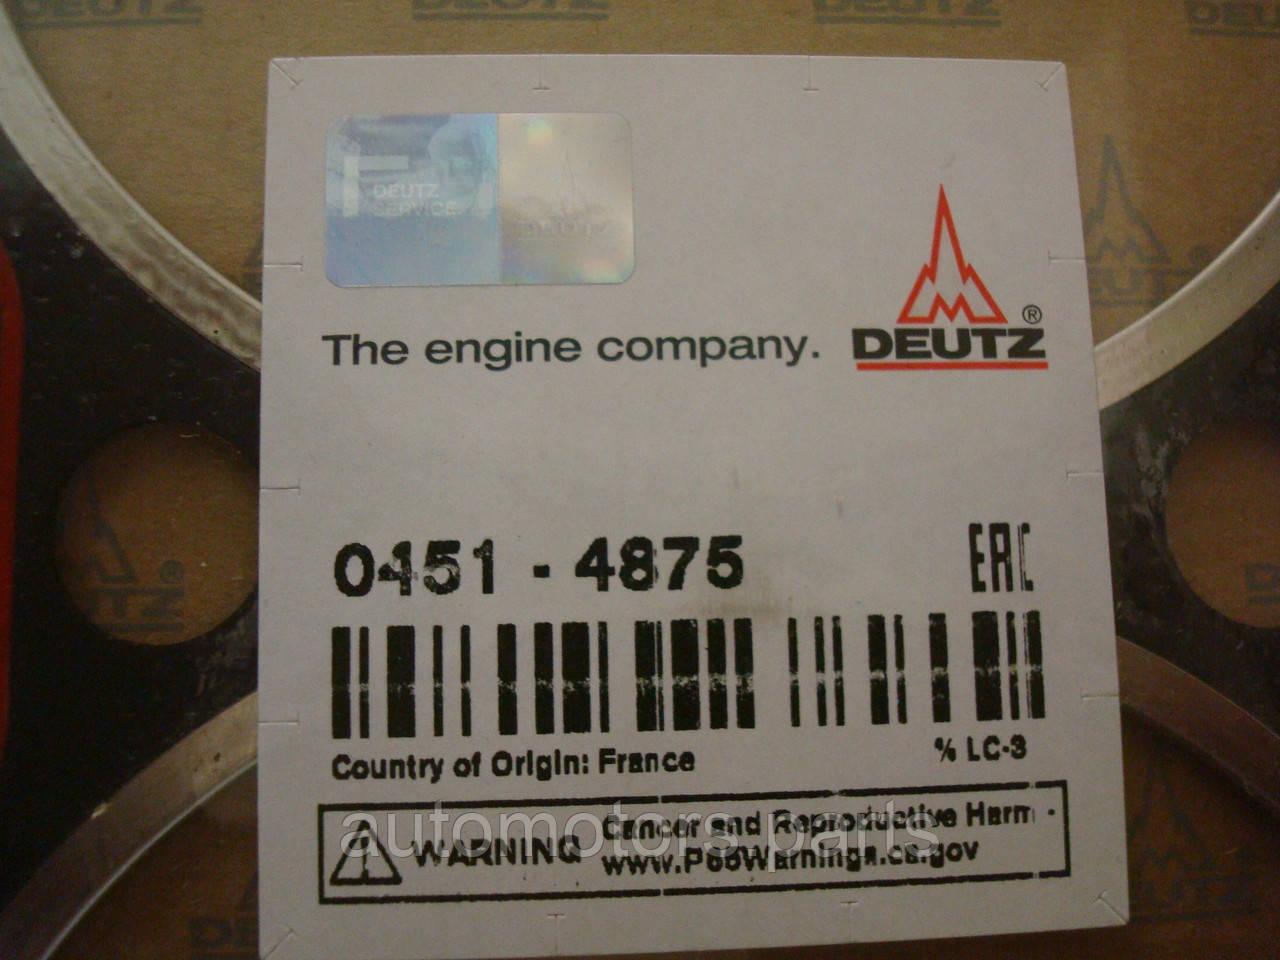 Прокладка головки блока цилиндра Deutz 04514875